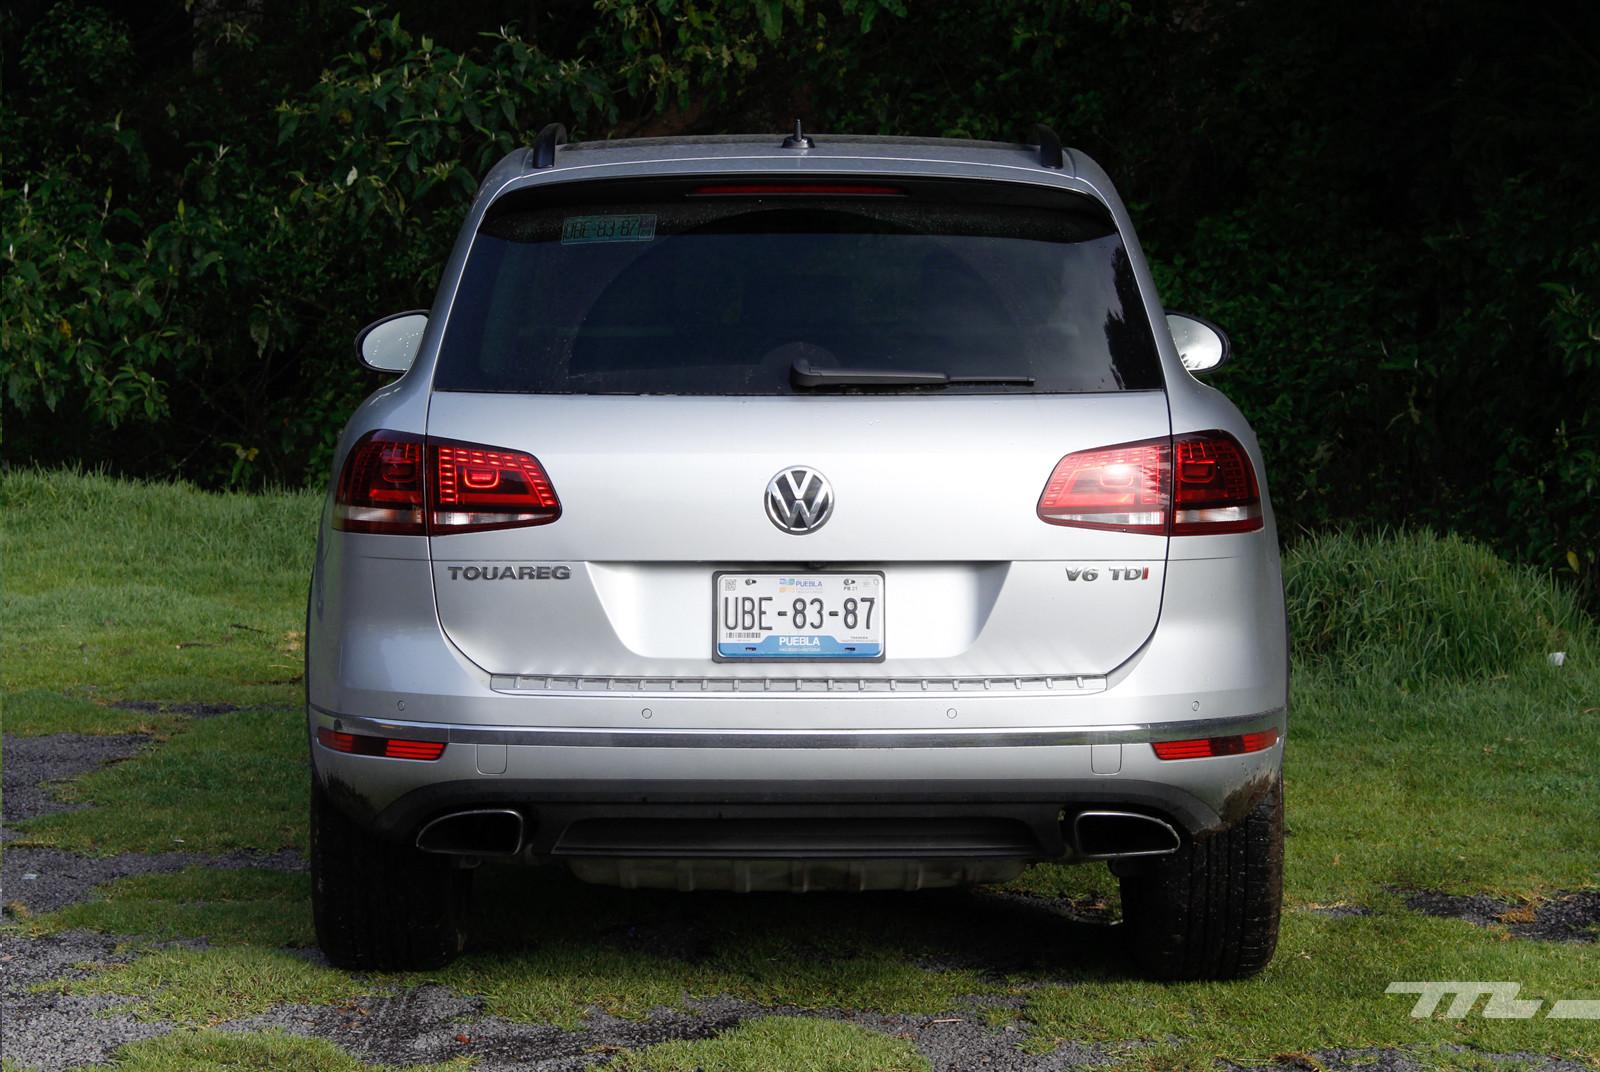 Volkswagen Touareg TDI Wolfsburg Edition